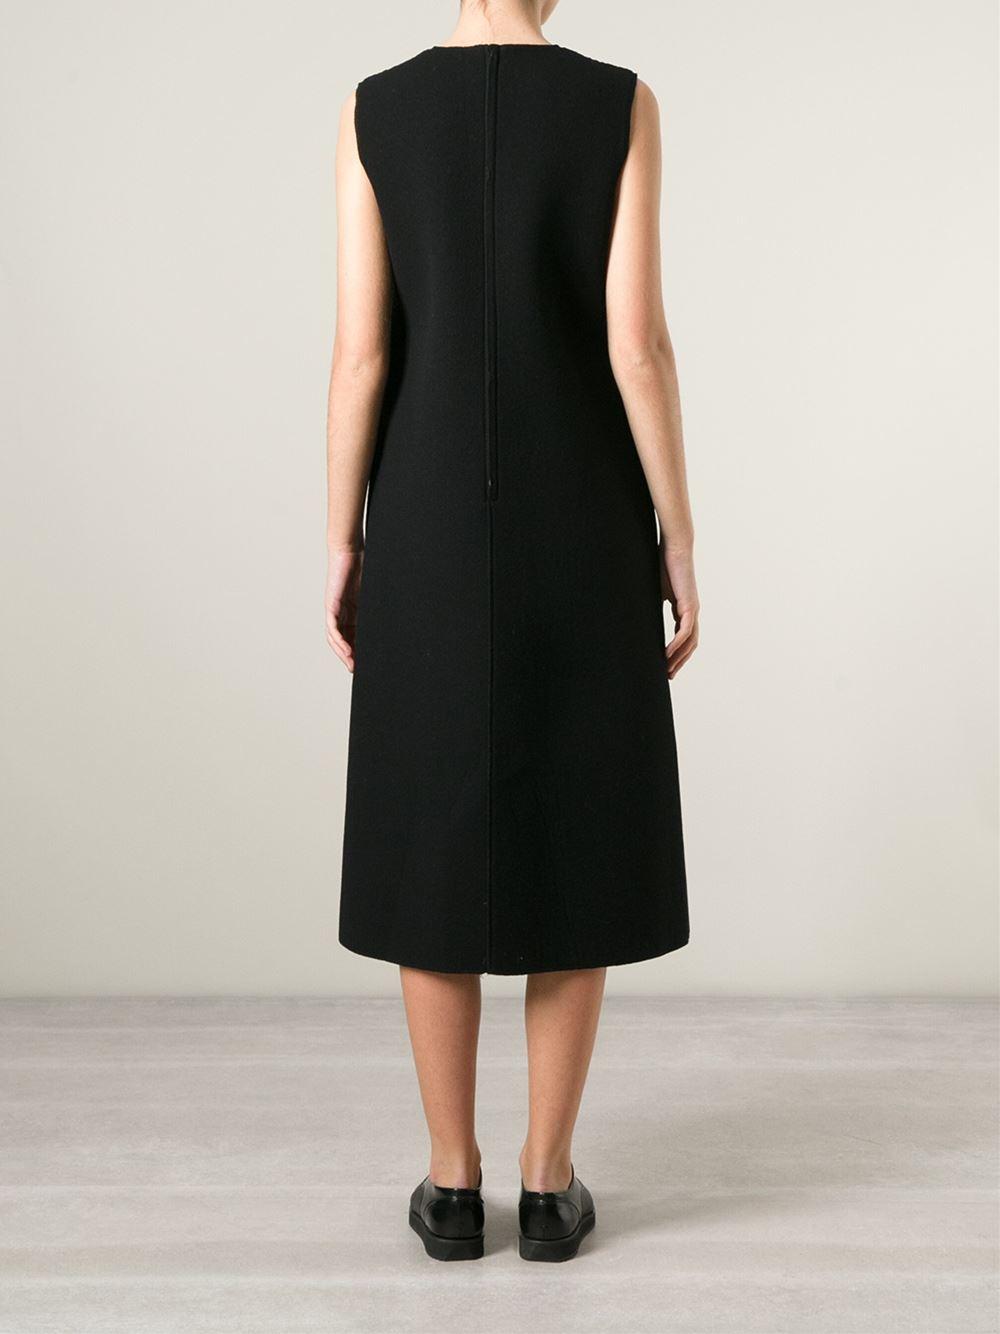 Comme Des Garons Robe De Chambre Padded Dress in Black  Lyst